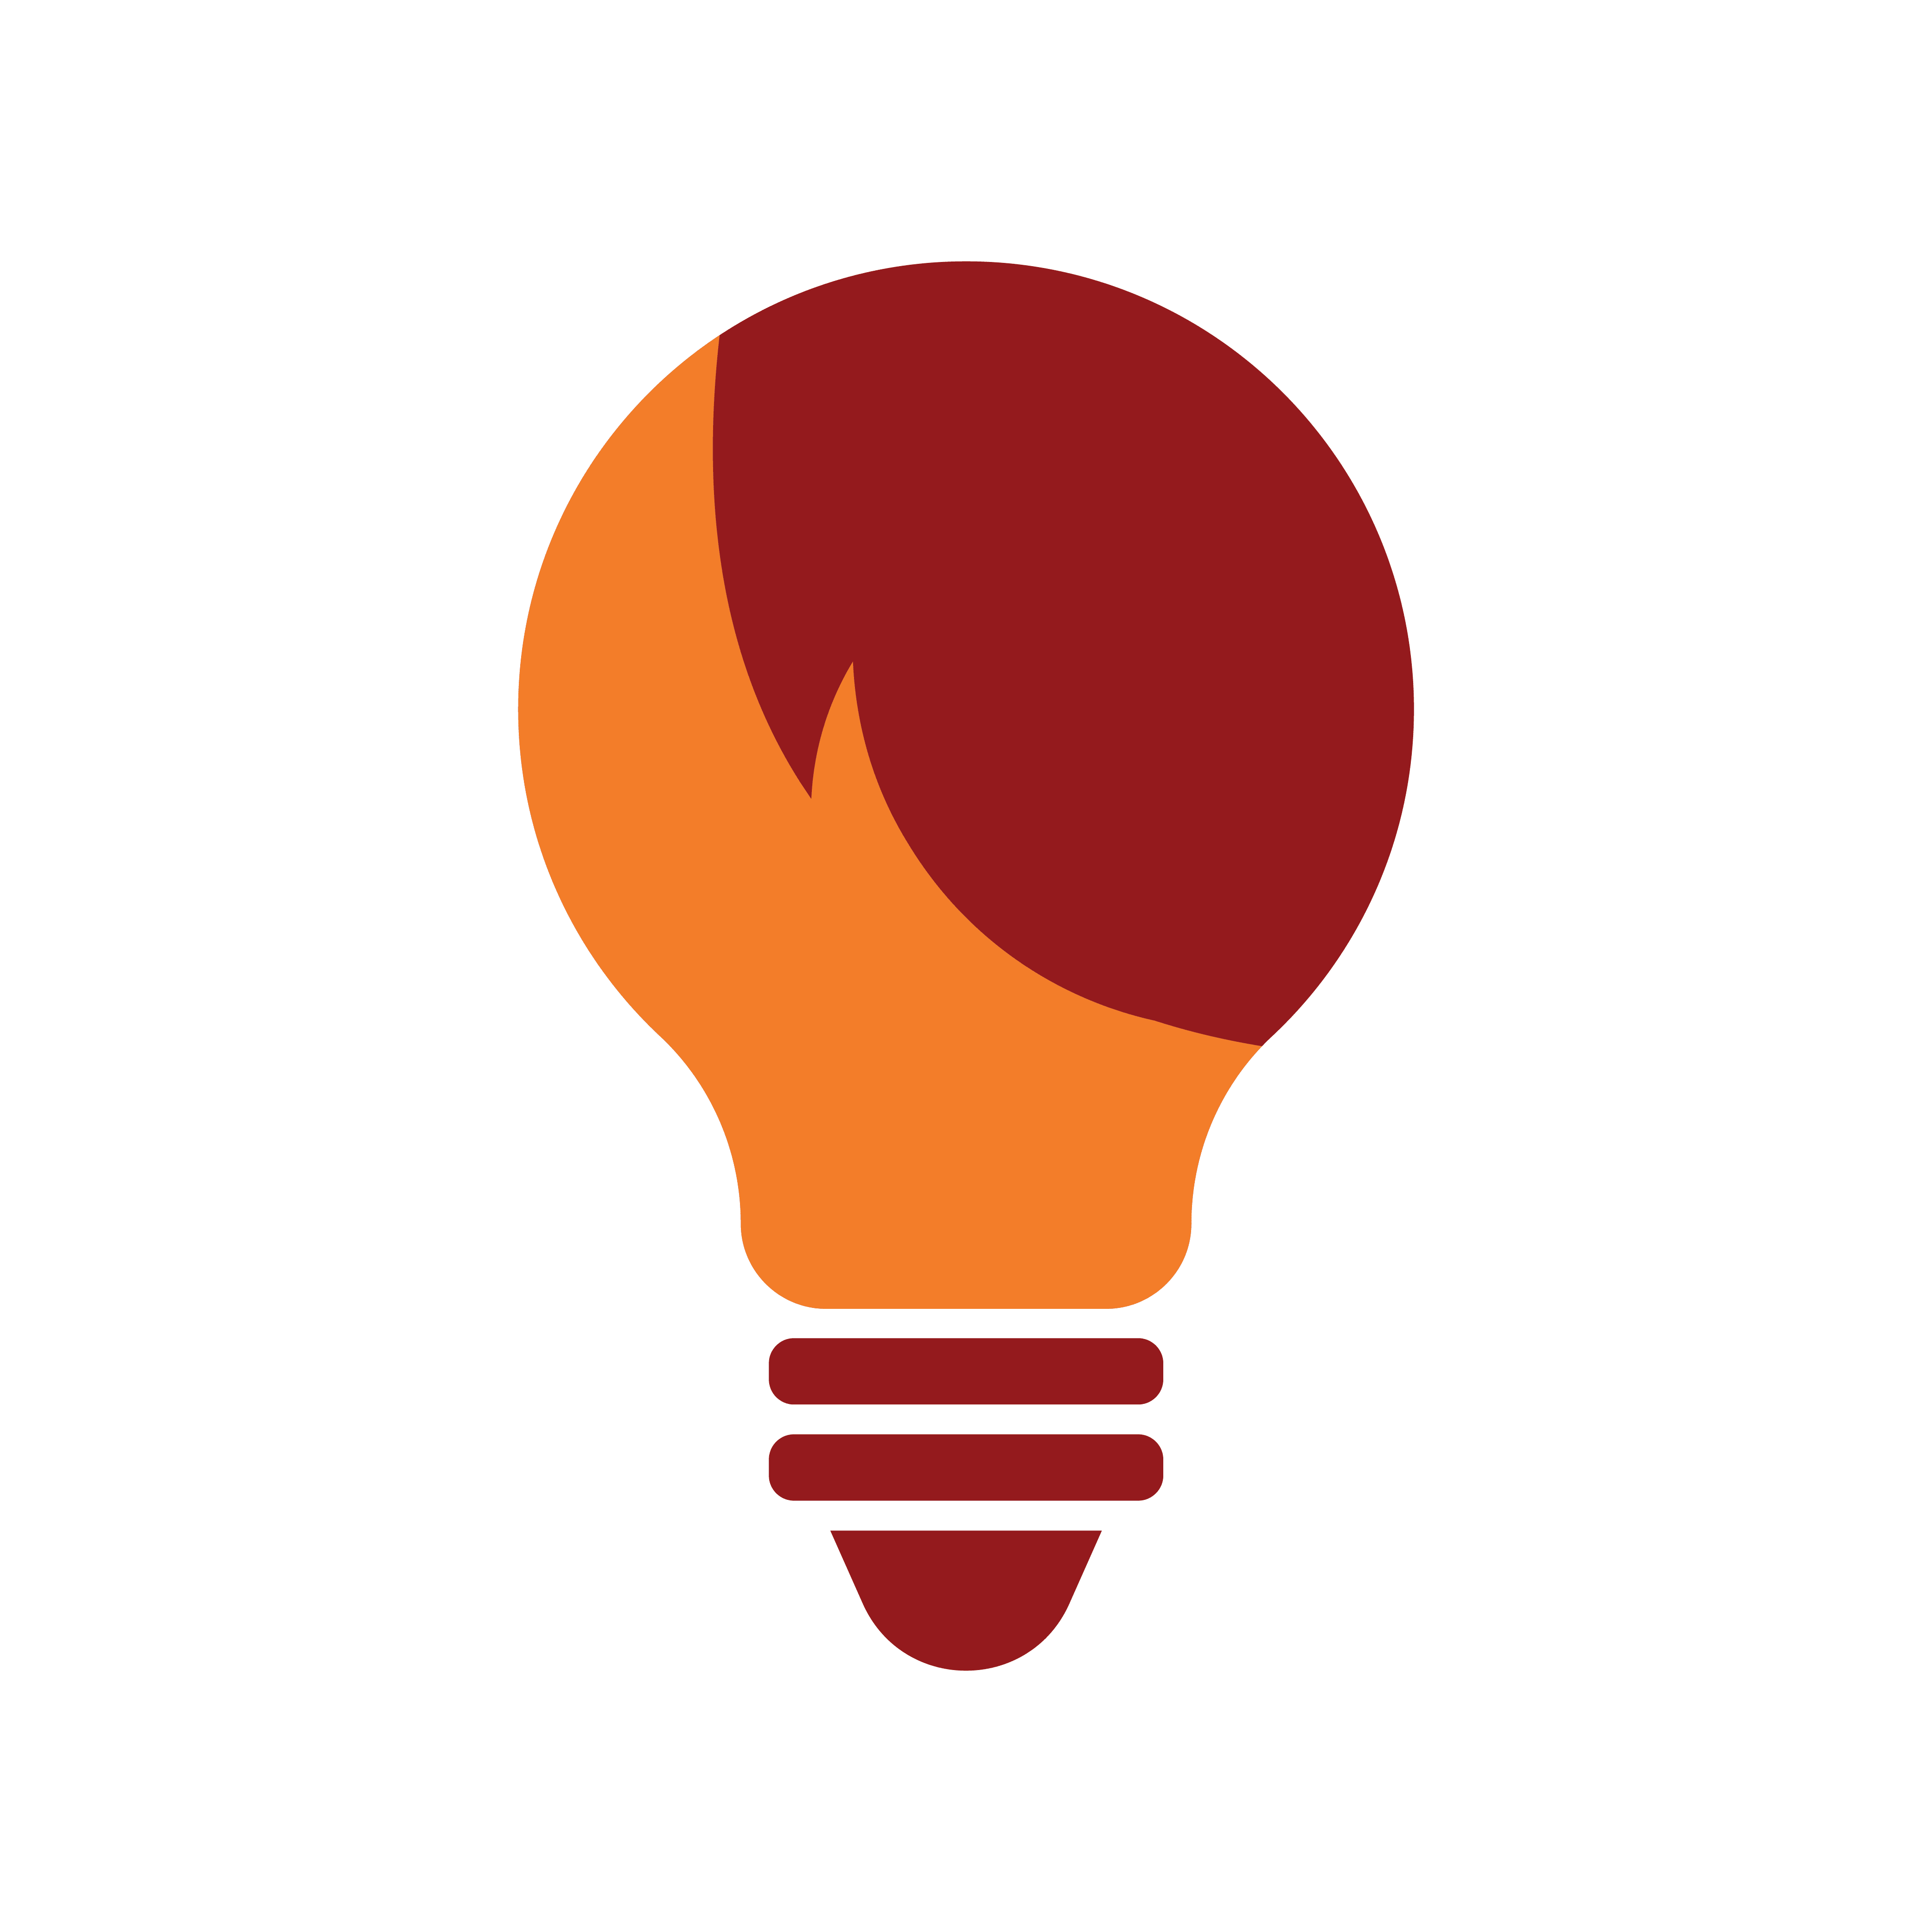 think more lightbulb graphic